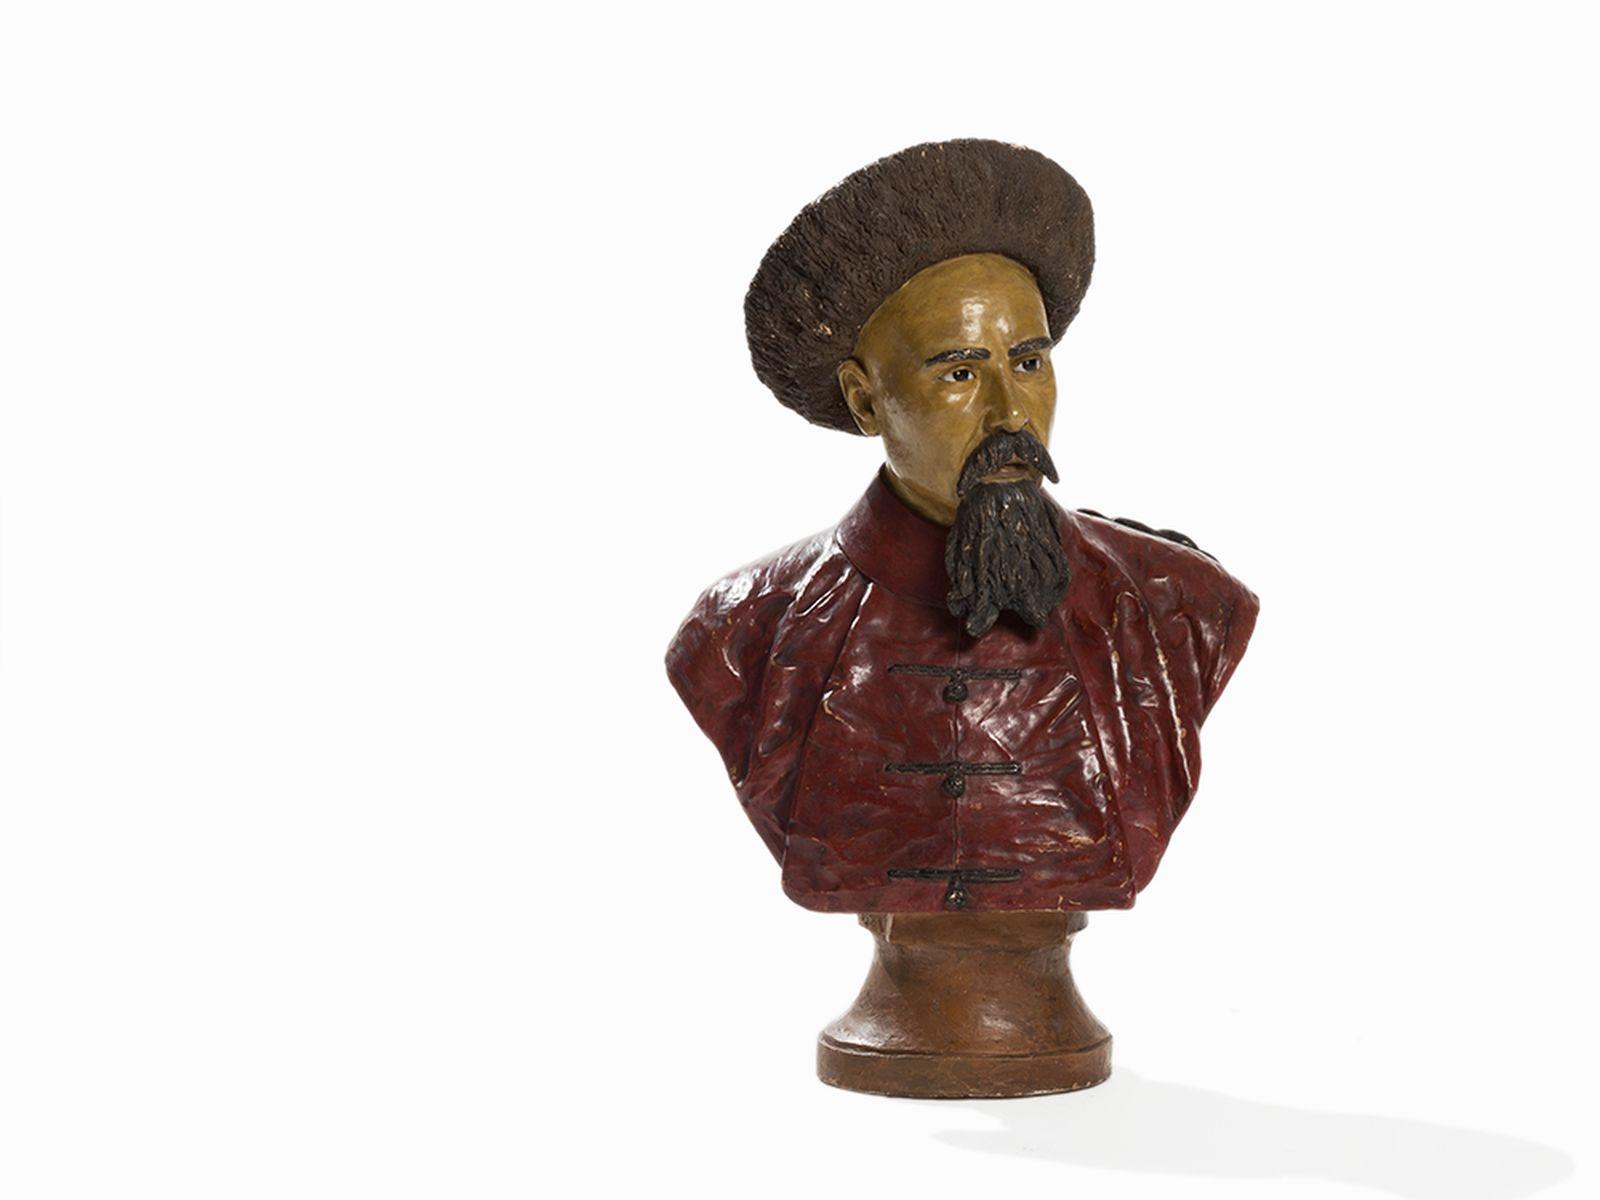 #92 Louis Fournier (1857–1917), Emperor Guangxu, Terracotta Bust, 1884   Louis Fournier (1857–1917), Kaiser Guangxu, Terrakottabüste, 1884 Image